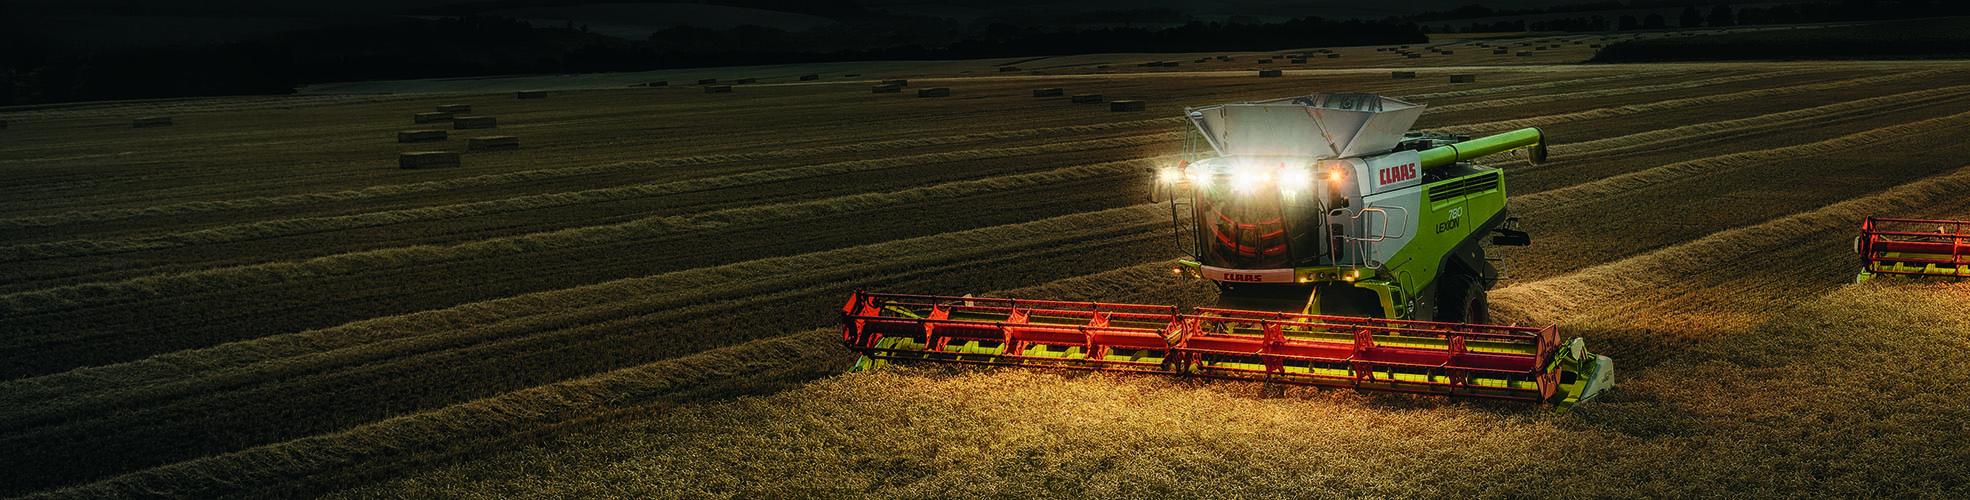 Ricambi Macchine Agricole